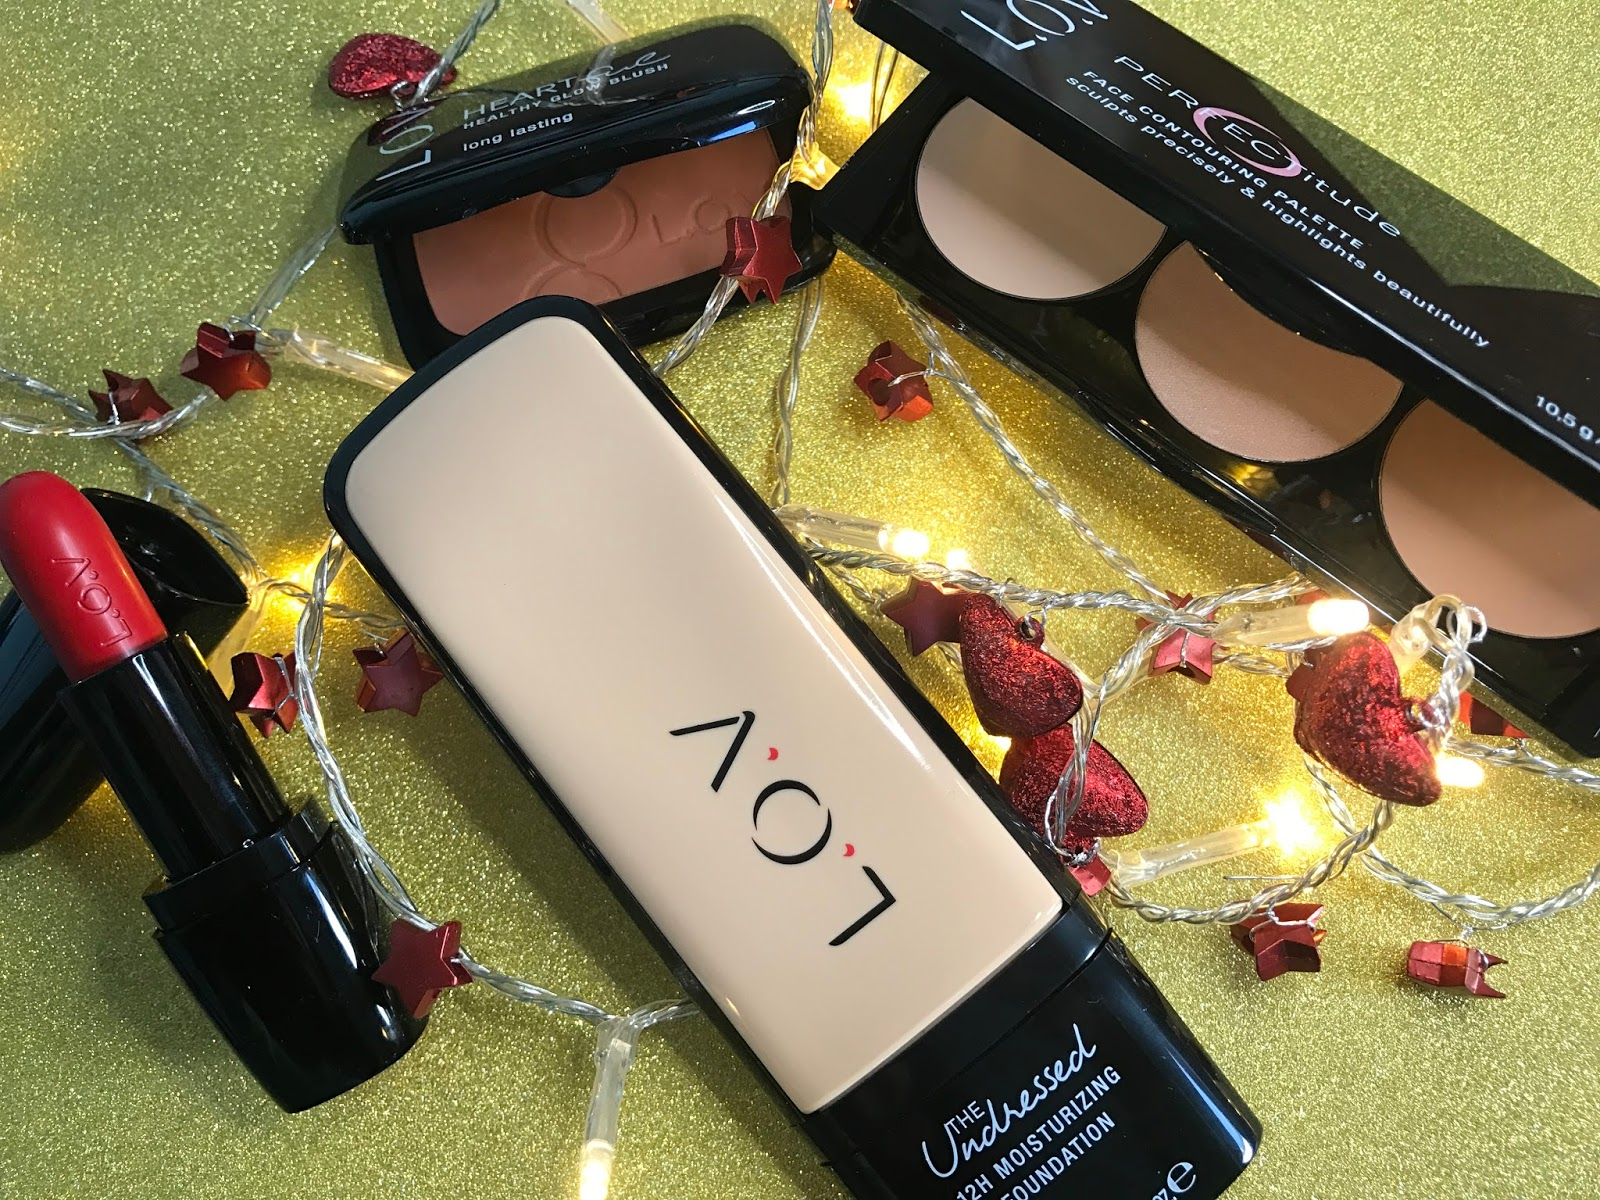 L.O.V. Cosmetics